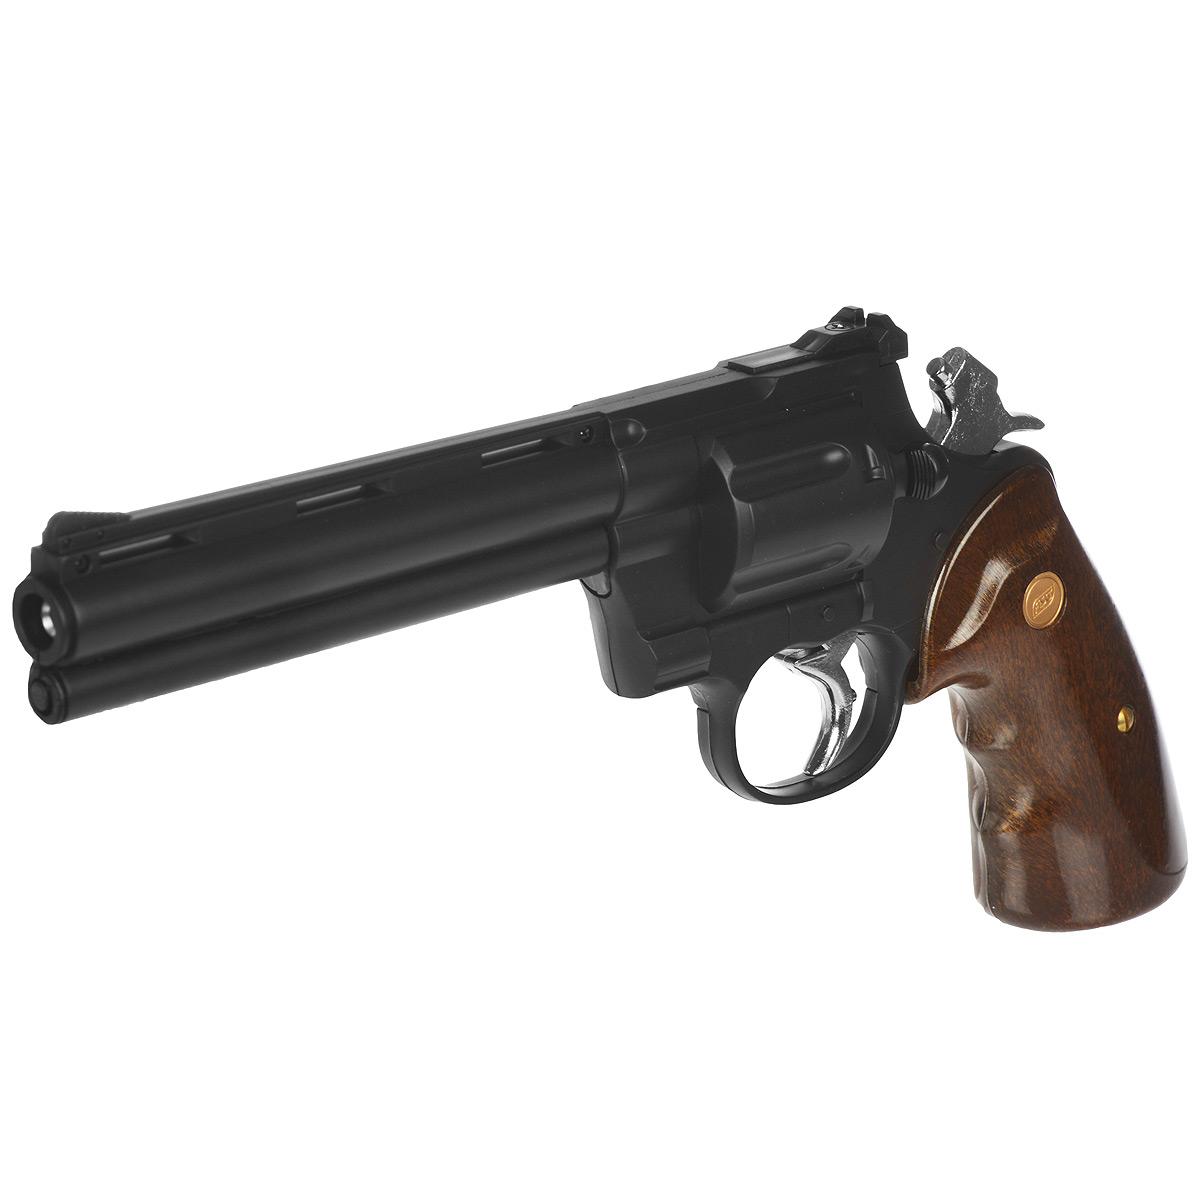 "ASG ASG ""Zastava R-357"" револьвер страйкбольный, 6 мм, цвет: Black (11542)"